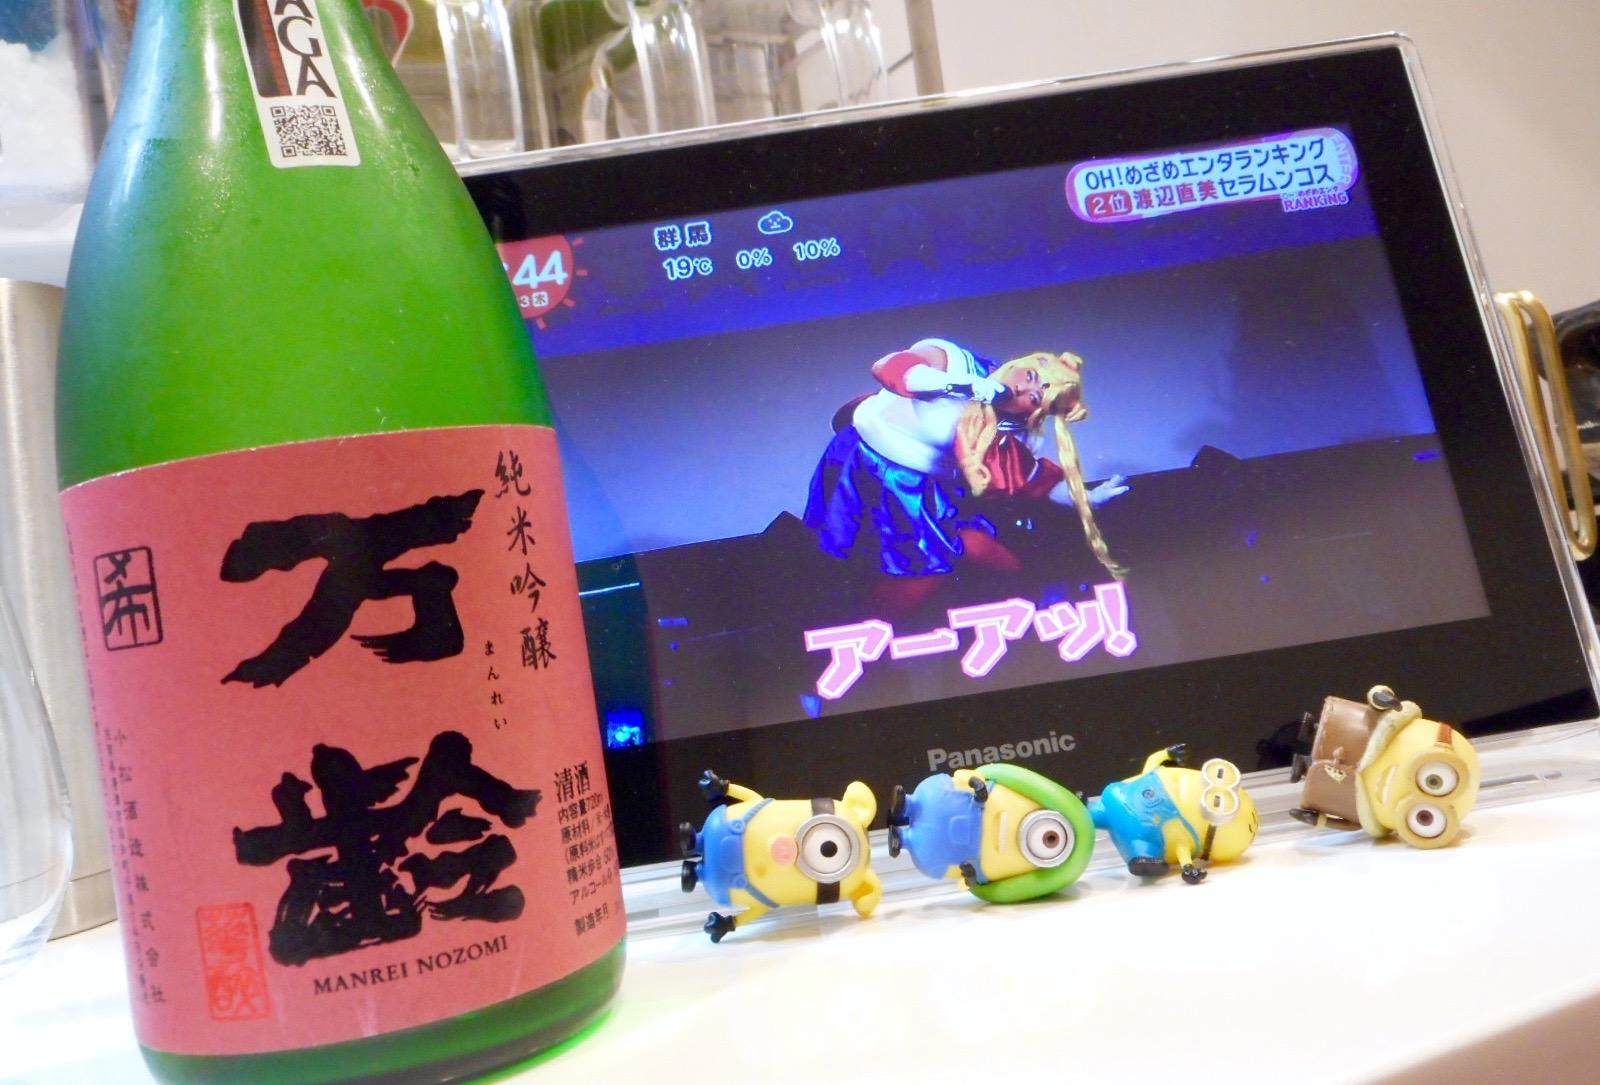 manrei_nozomi27by1.jpg